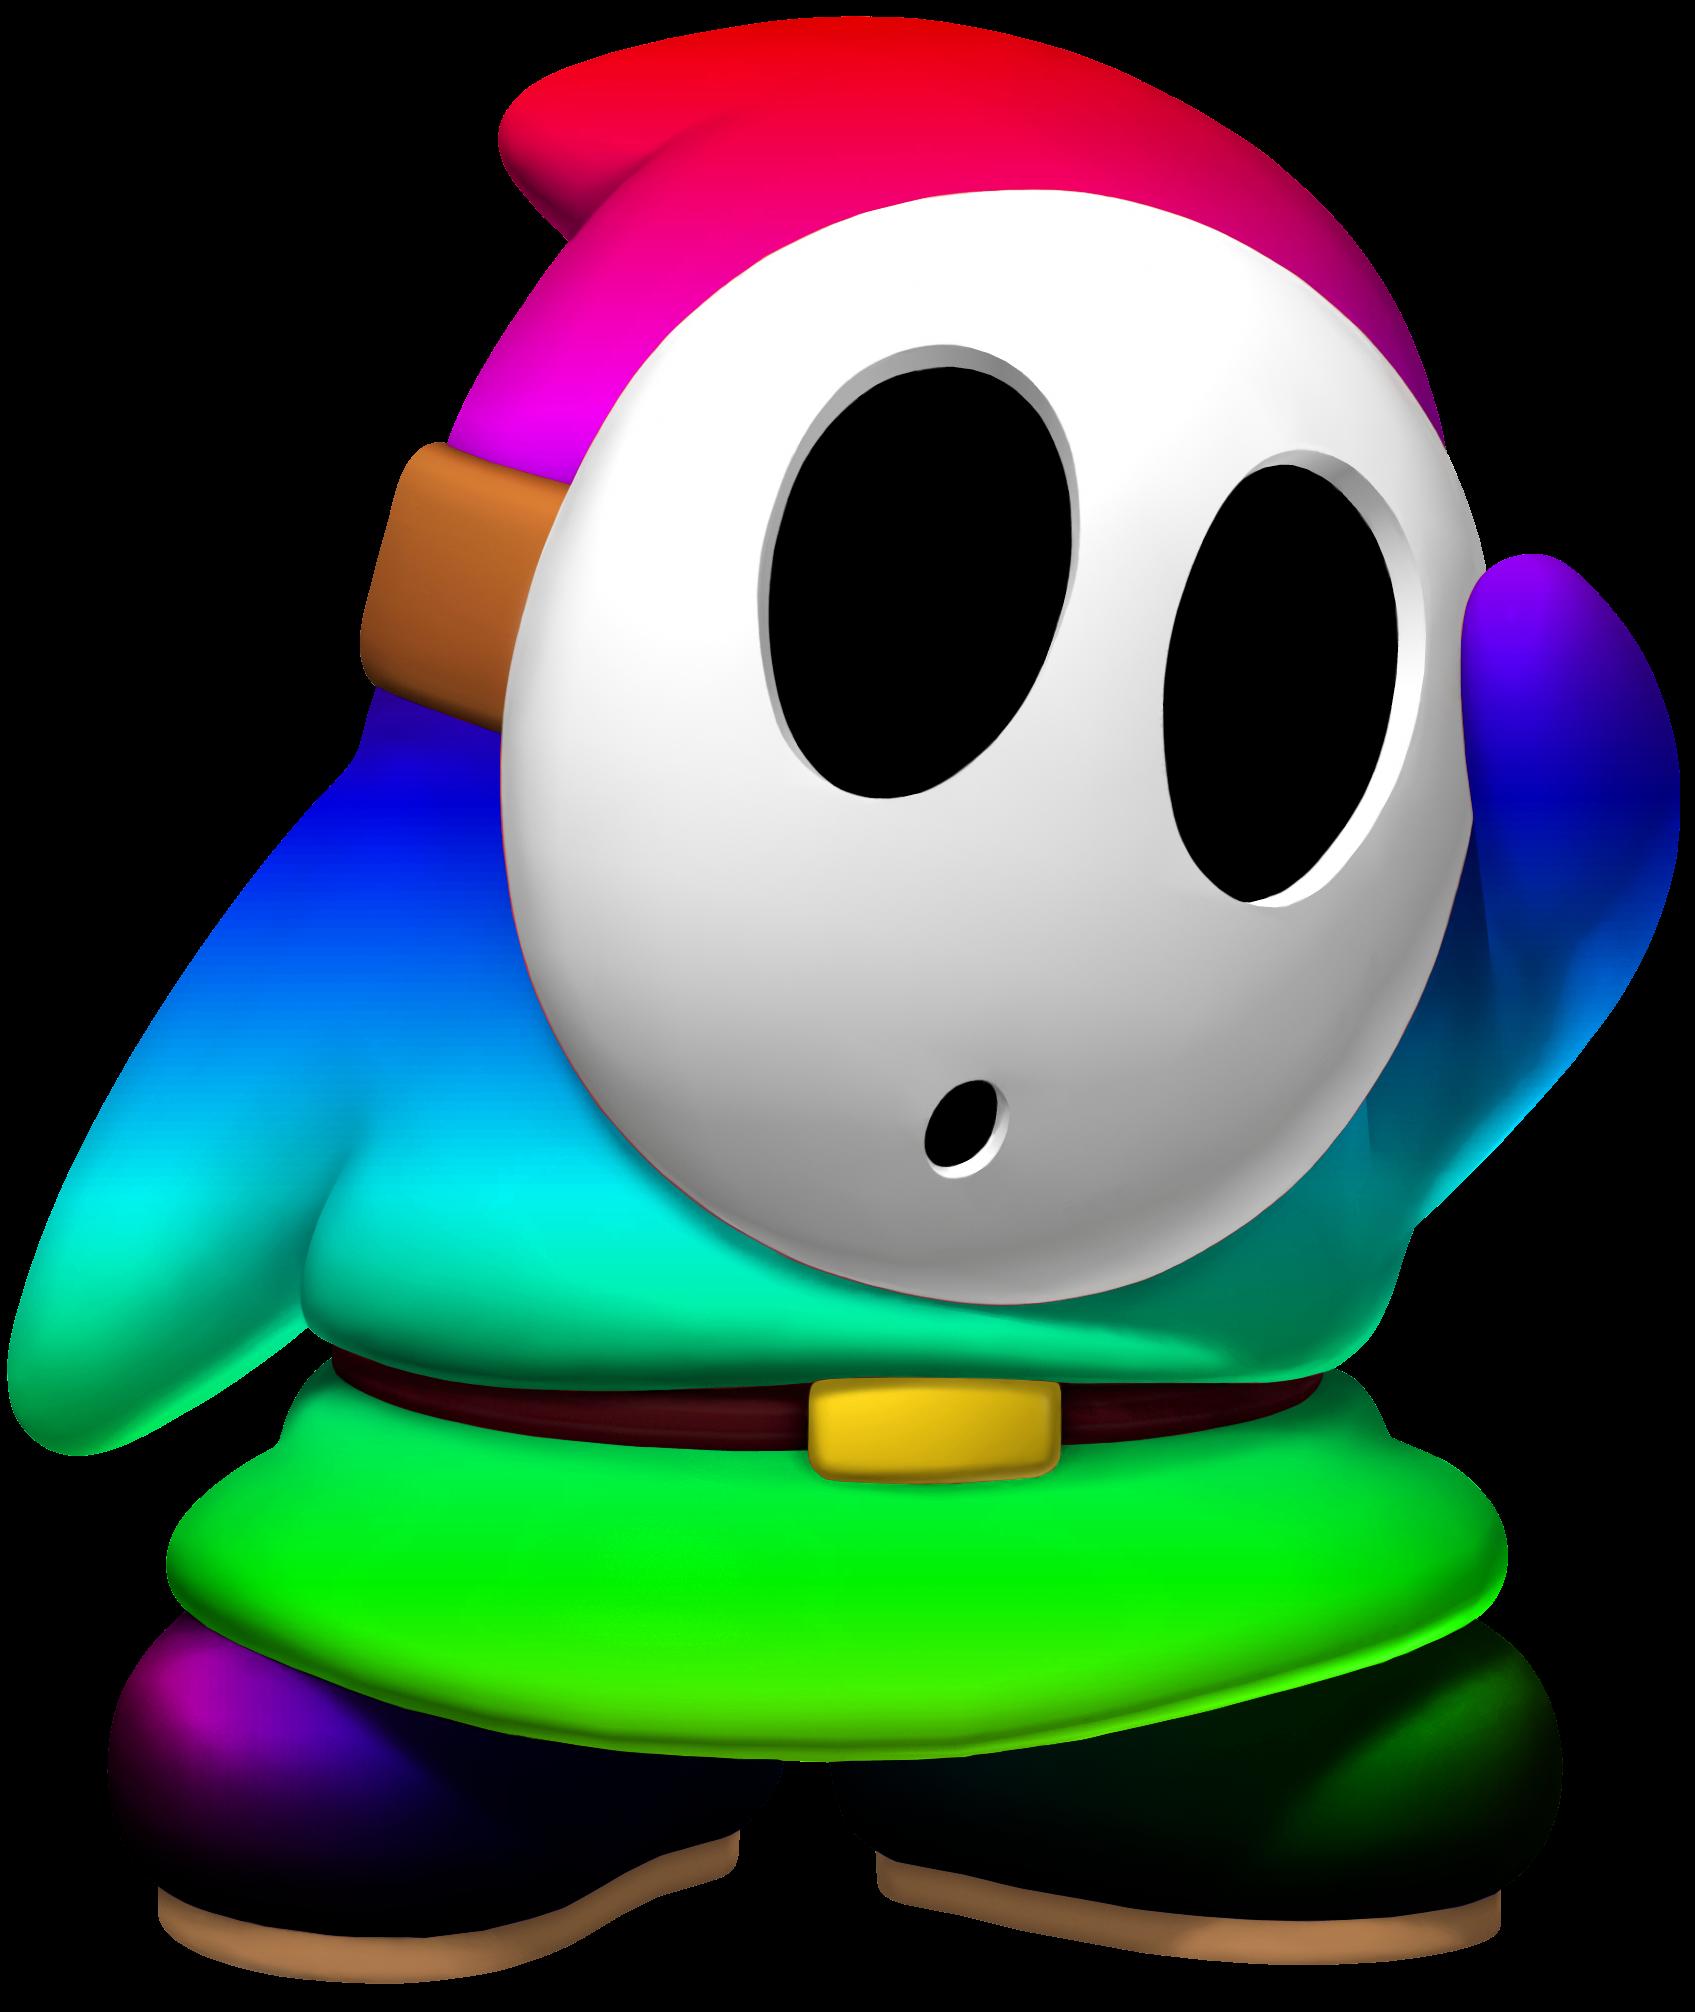 Image acl rainbow guy. Shy clipart shy man